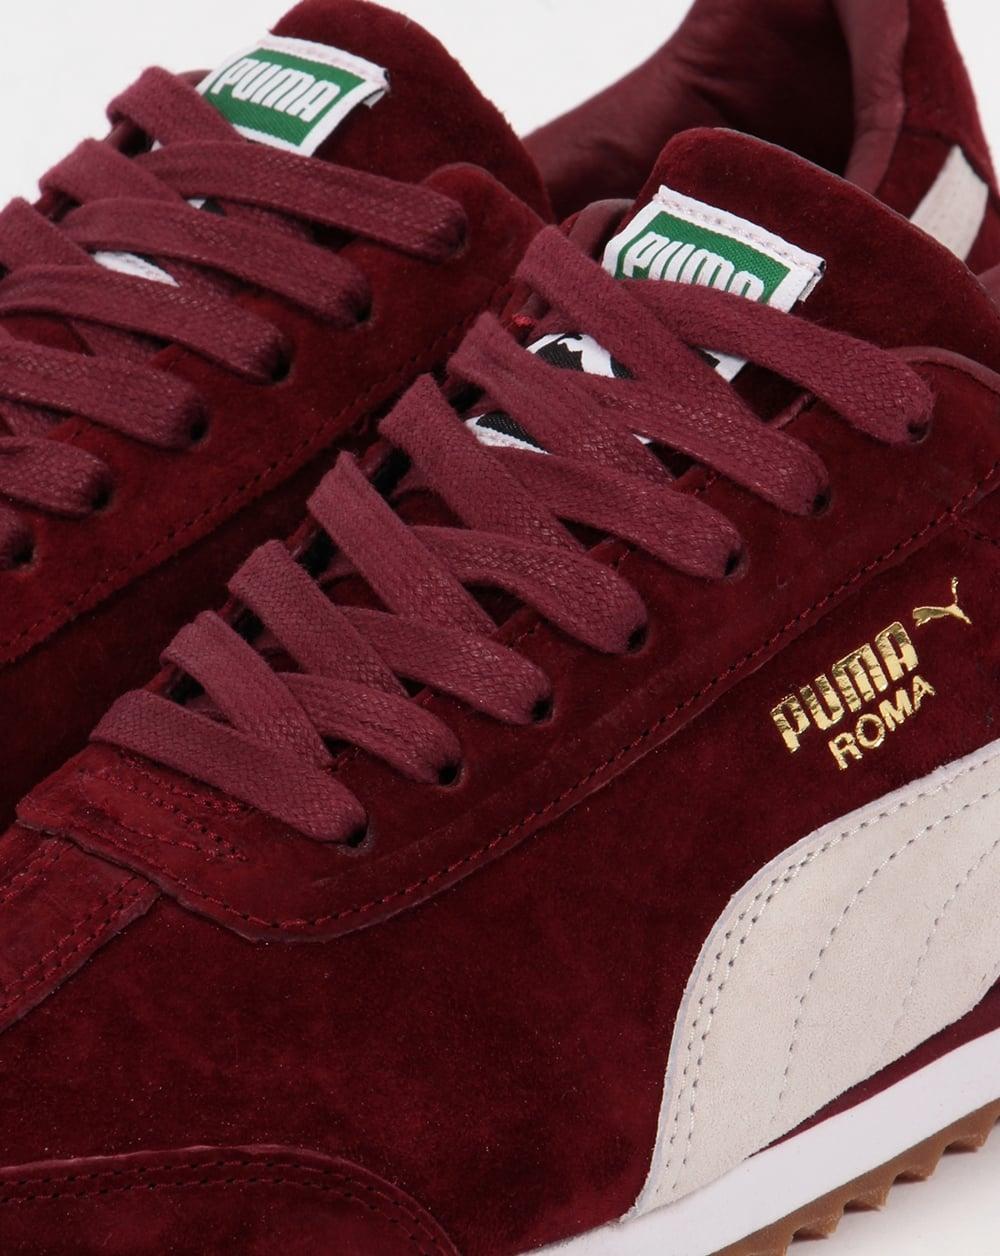 Puma Roma Trainers Burgundy/White,shoes